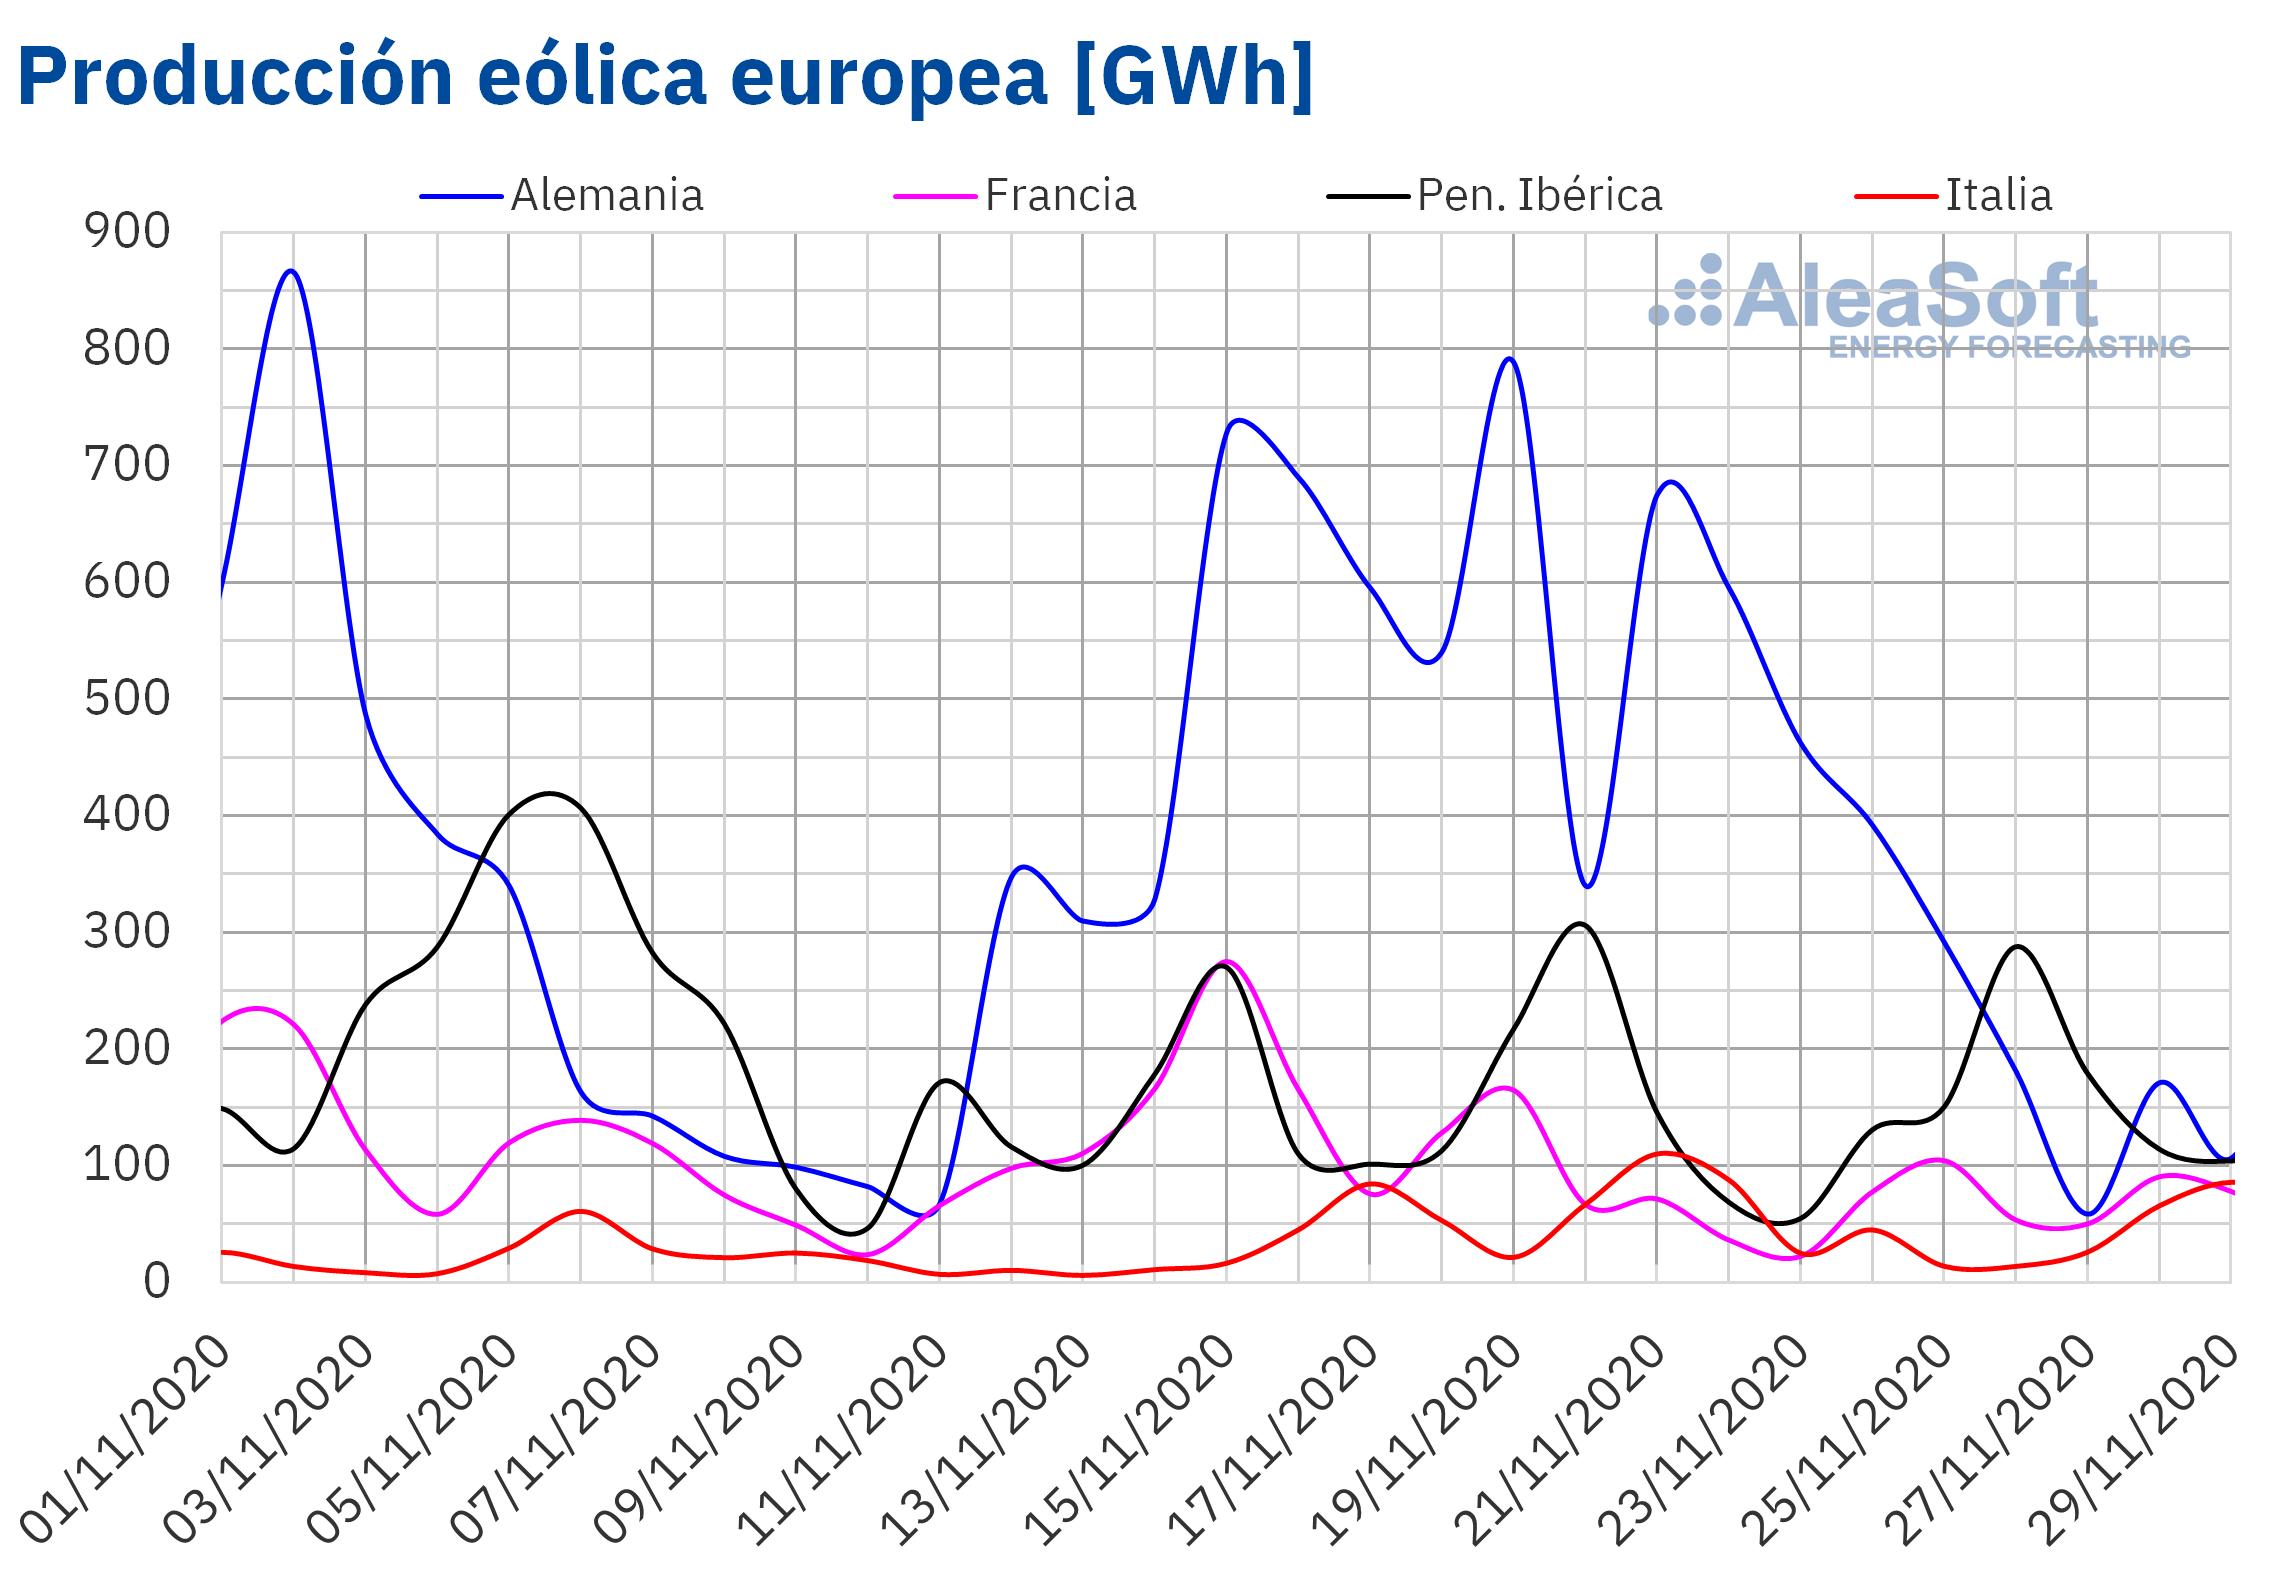 AleaSoft - Produccion eólica de Europa